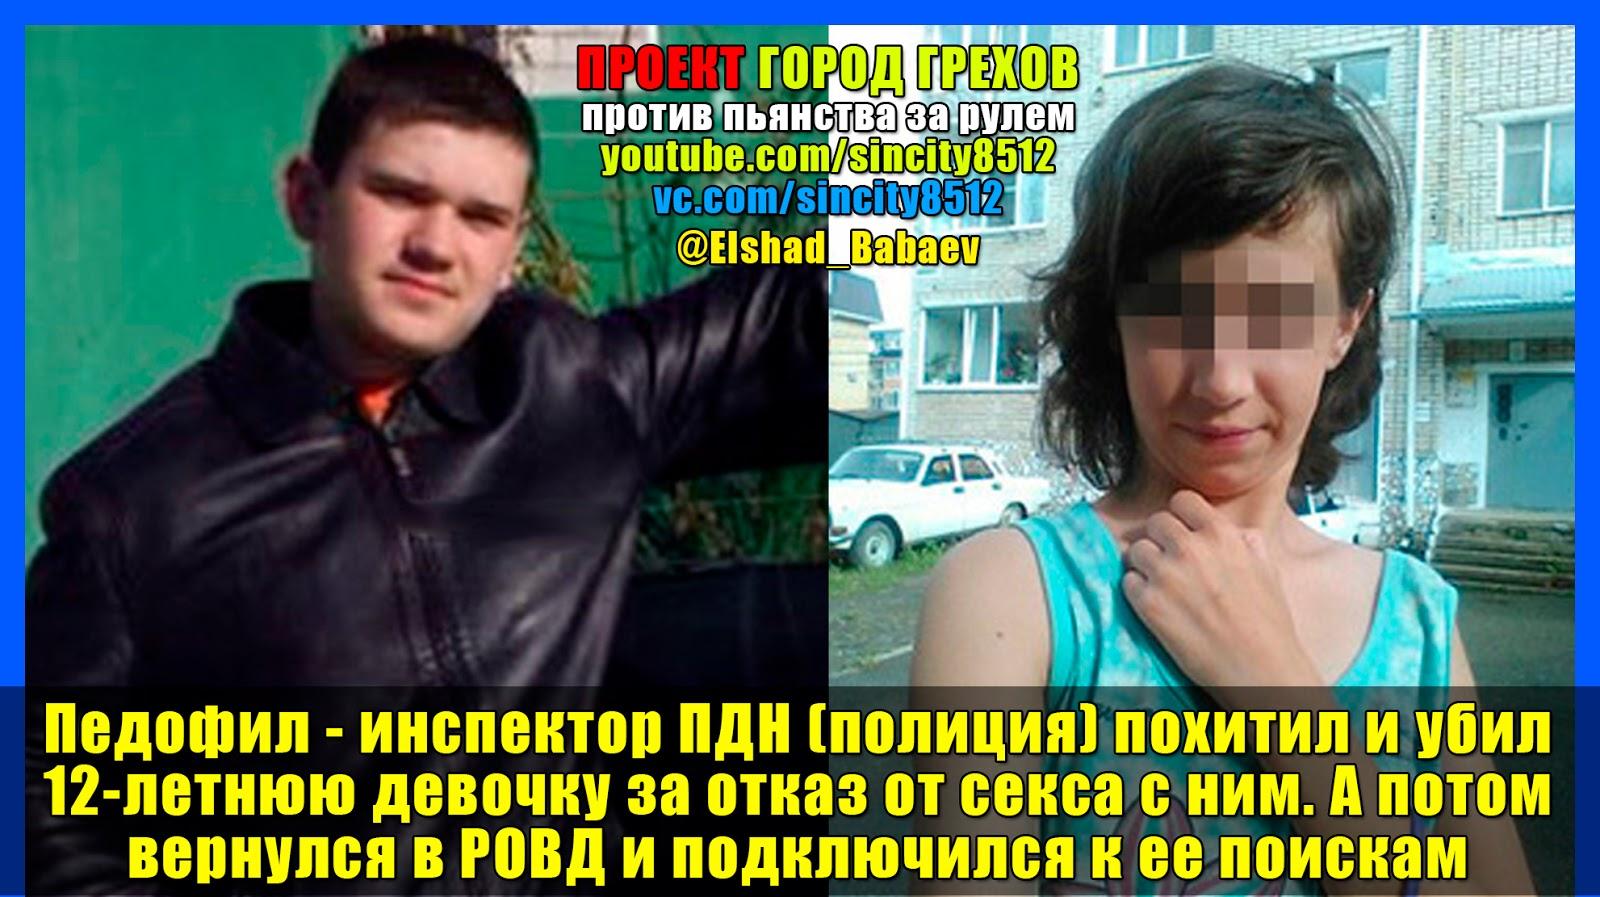 Девочку похитили для секса